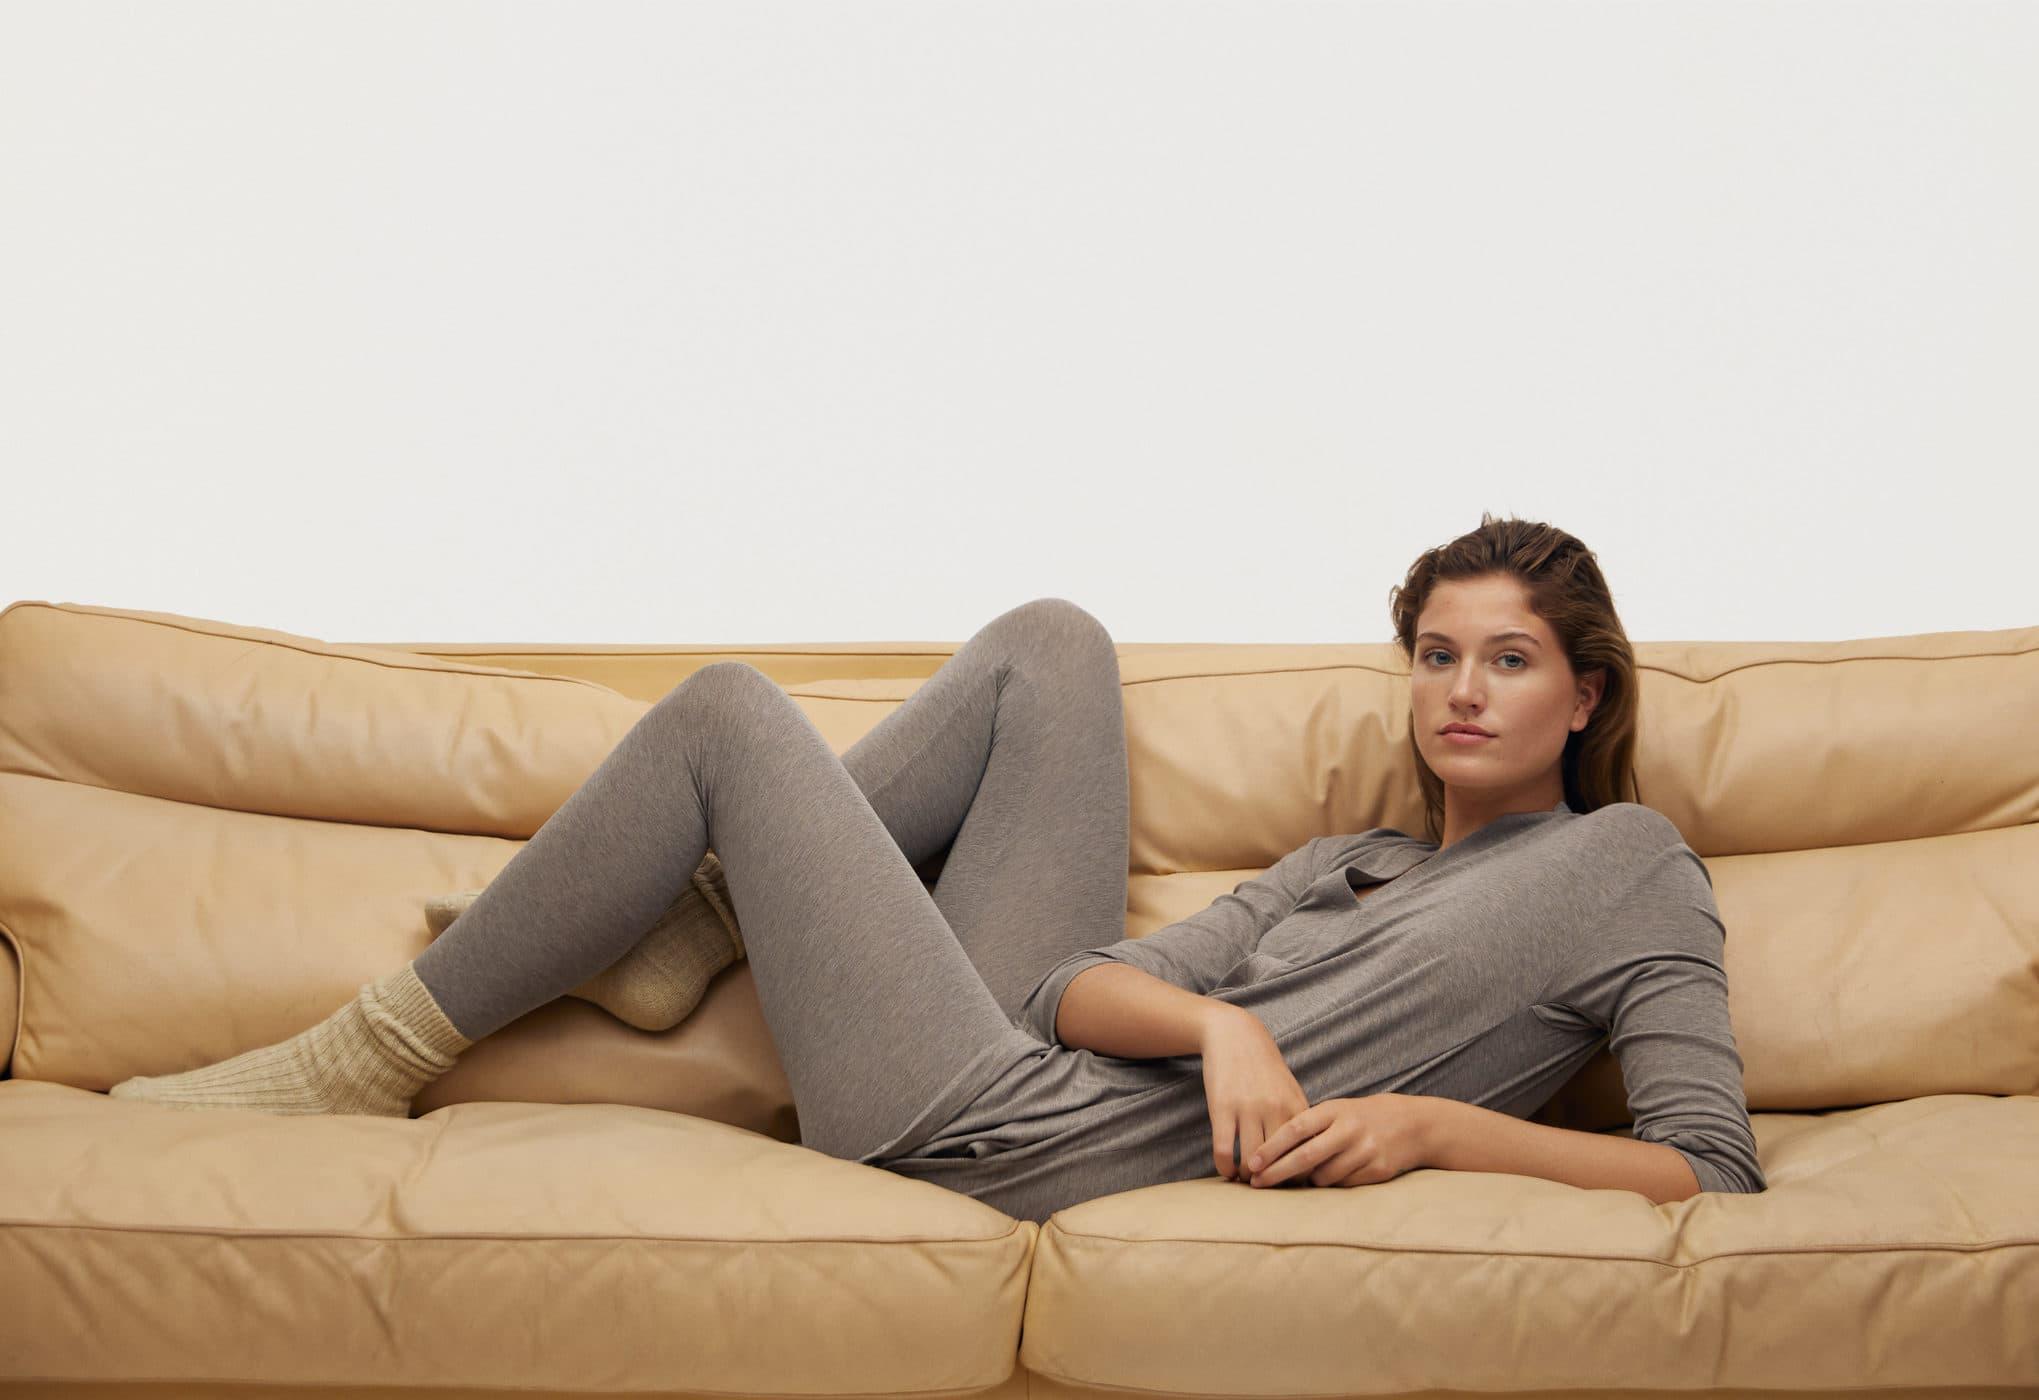 Knit leggings - General plane